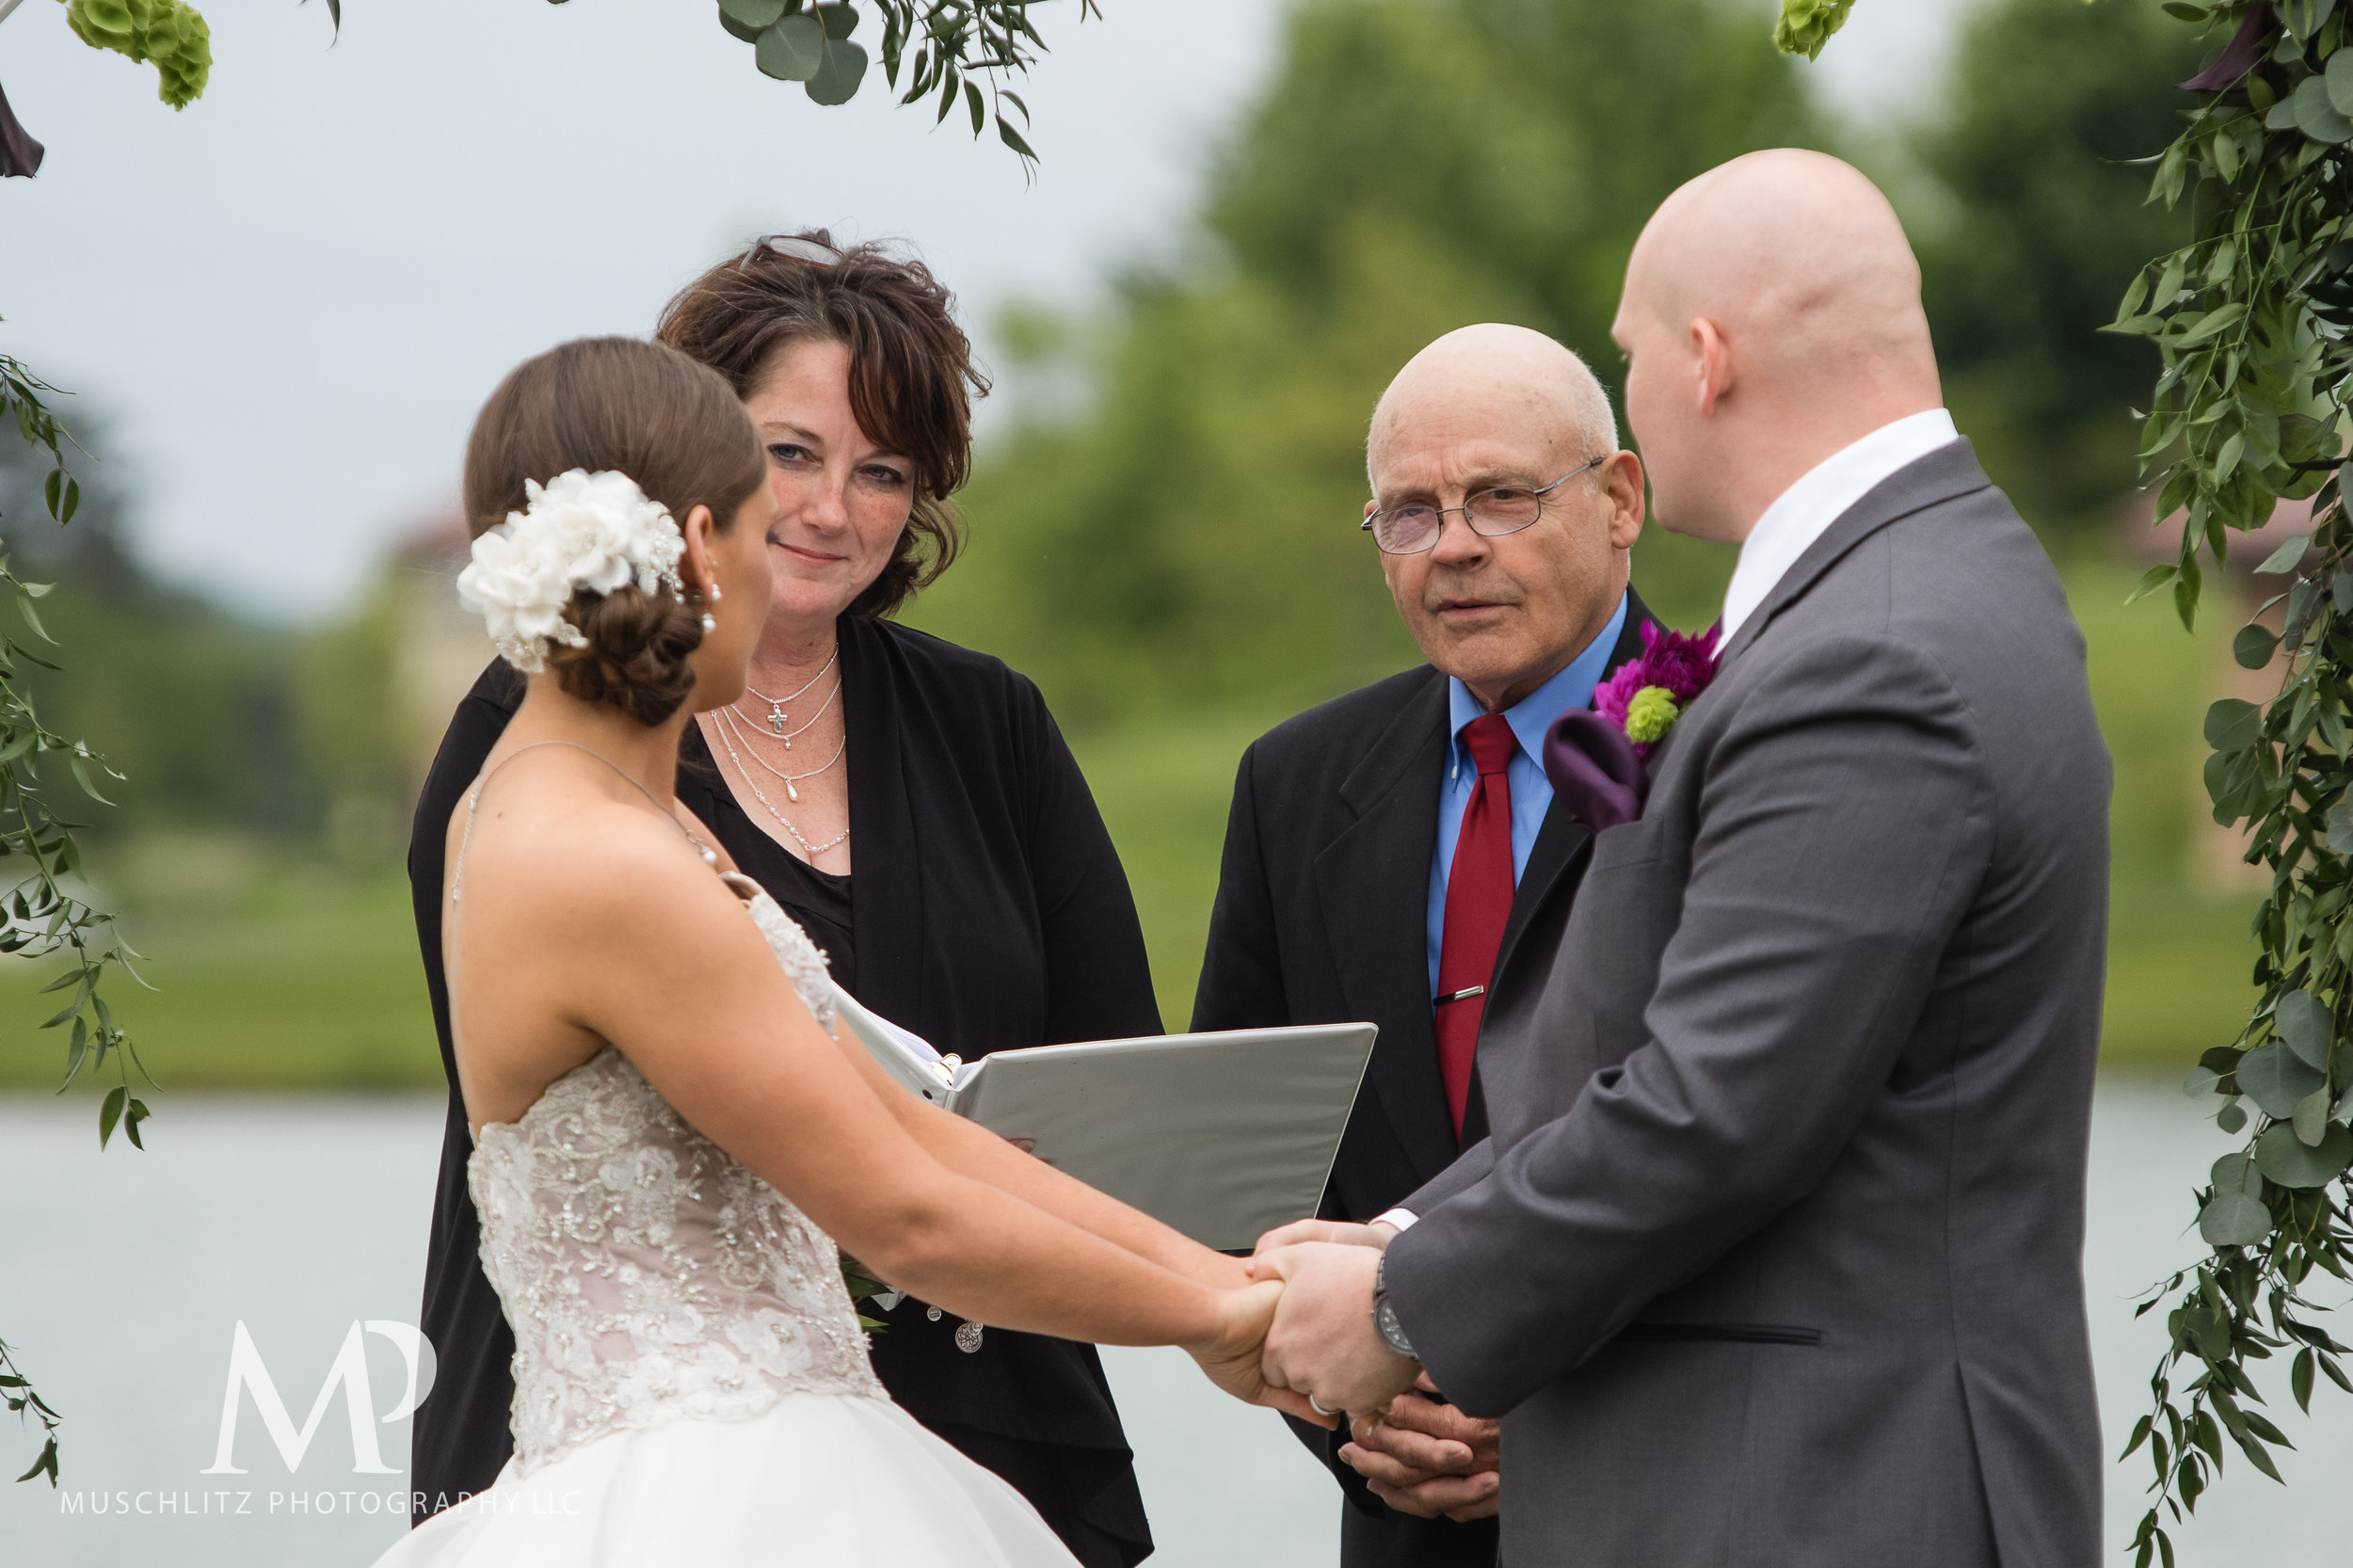 club-at-corazon-wedding-ceremony-reception-columbus-dublin-ohio-ohio-university-theme-042.JPG